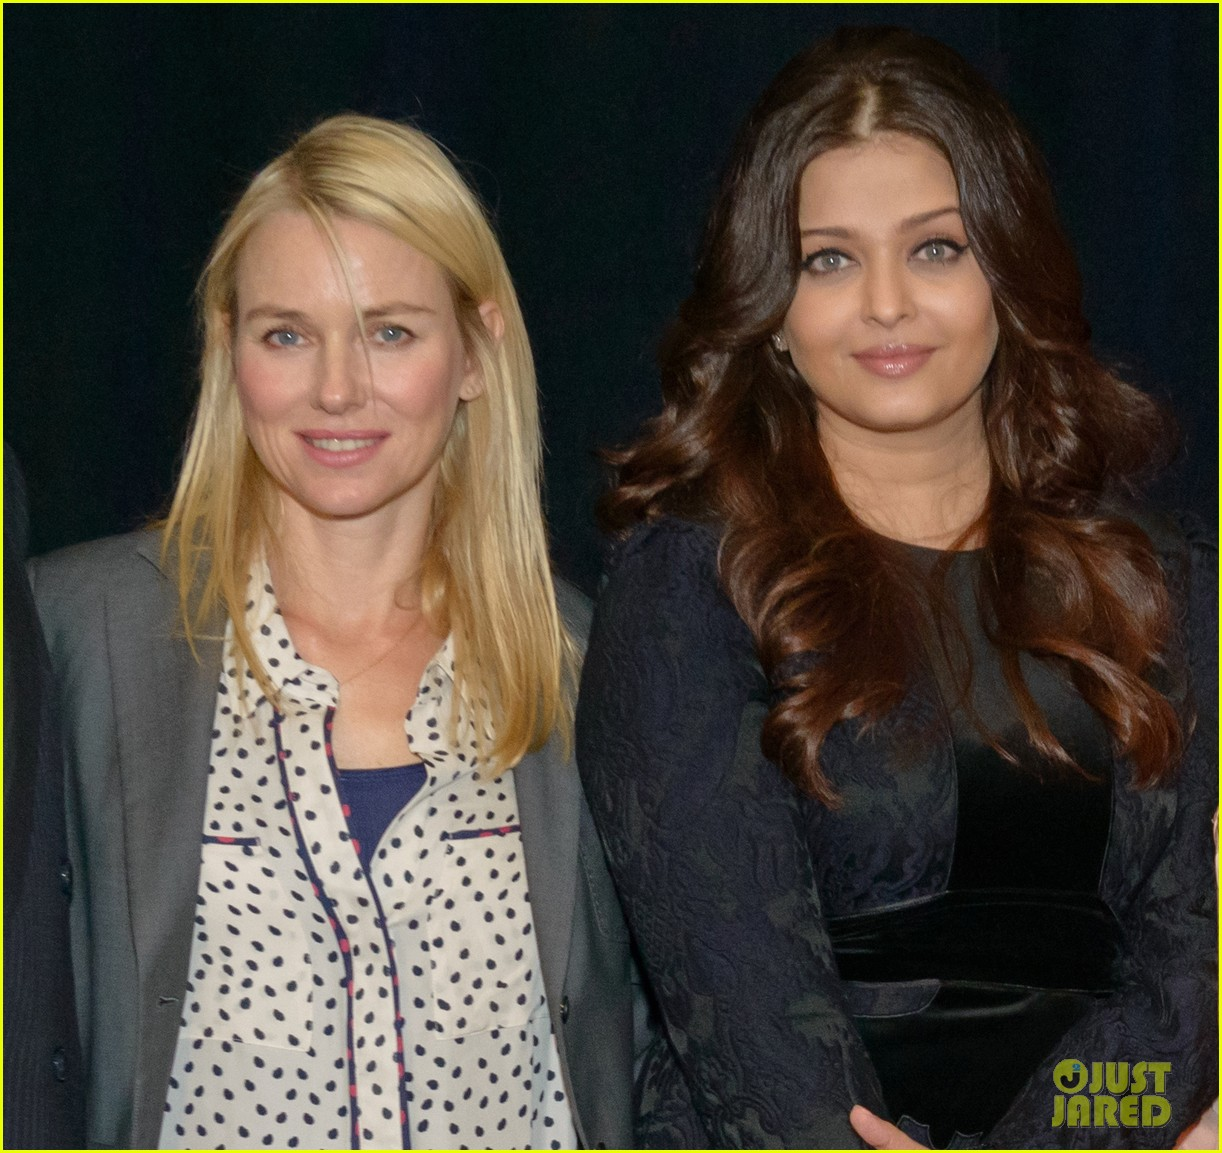 Aishwarya Rai Unaids New Goodwill Ambassador Photo 2727969 Aishwarya Rai Naomi Watts Pictures Just Jared